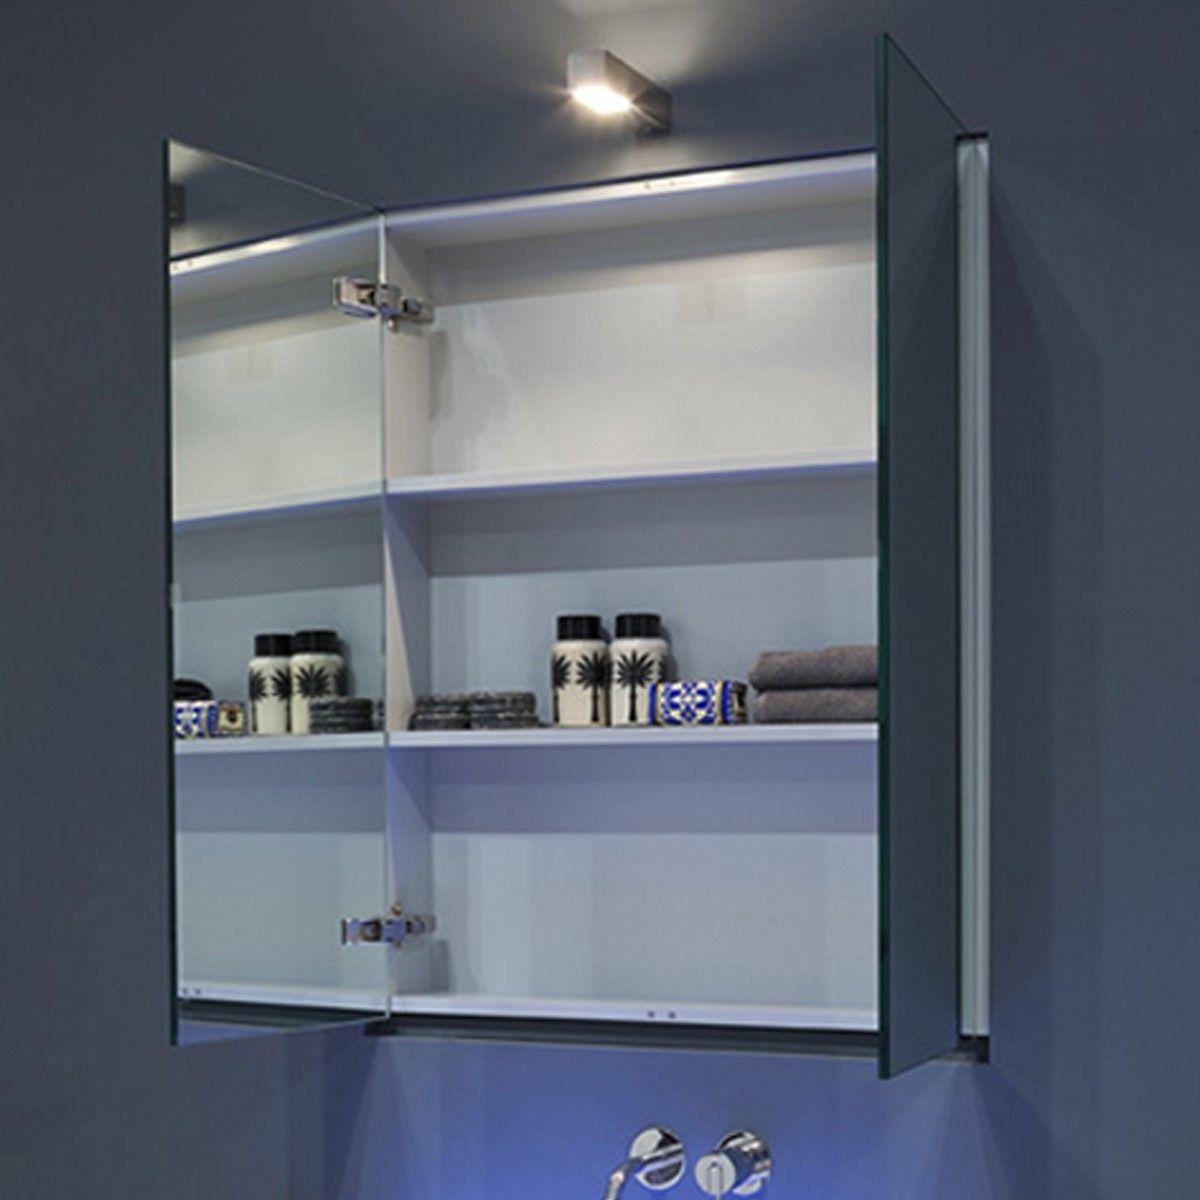 Зеркальный шкаф Antonio Lupi Mantra Mantra275 ФОТО